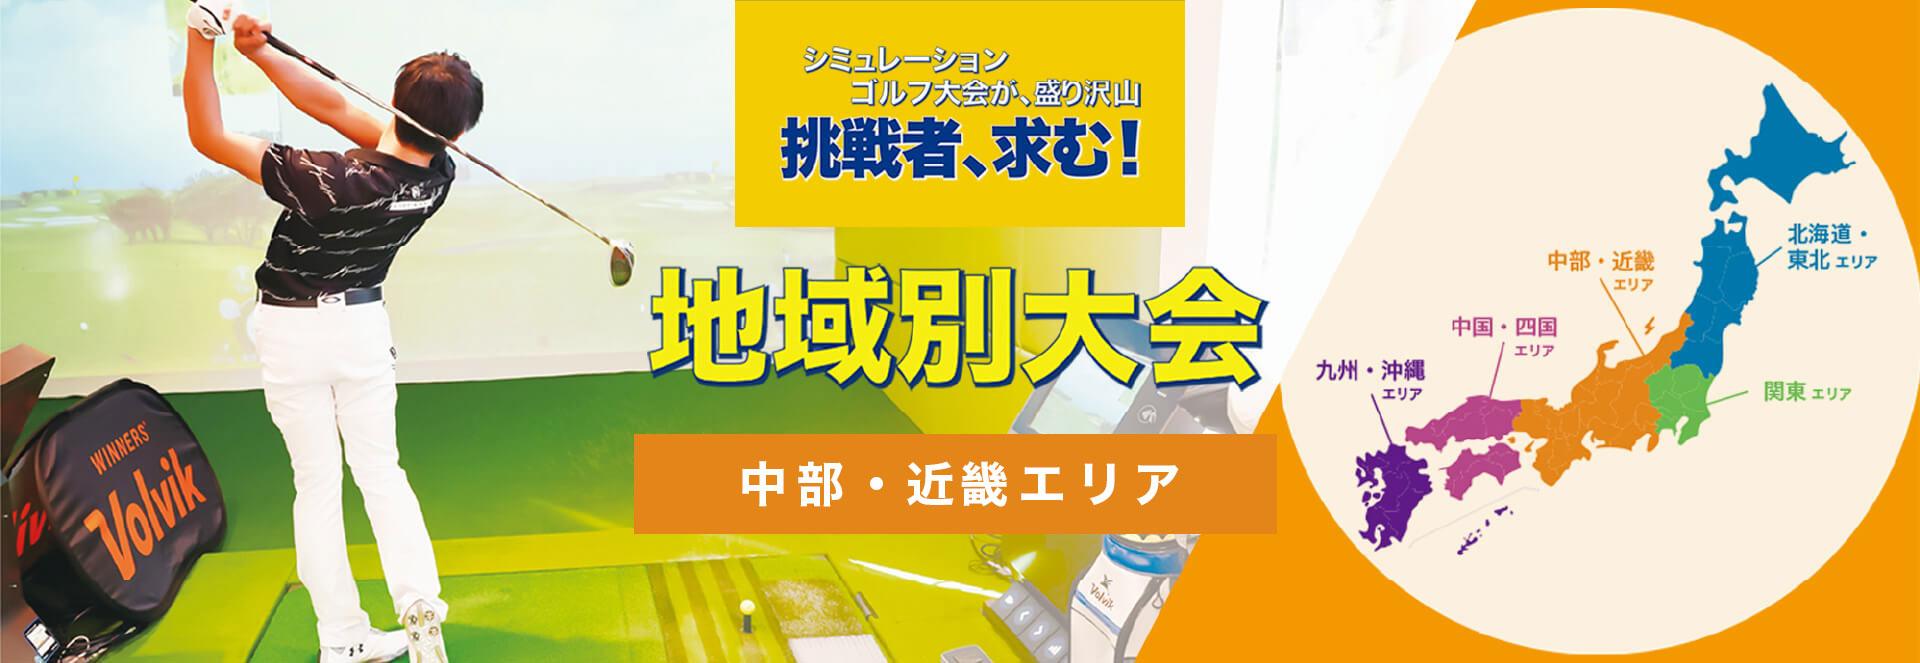 地域別大会/4月/中部・近畿エリア